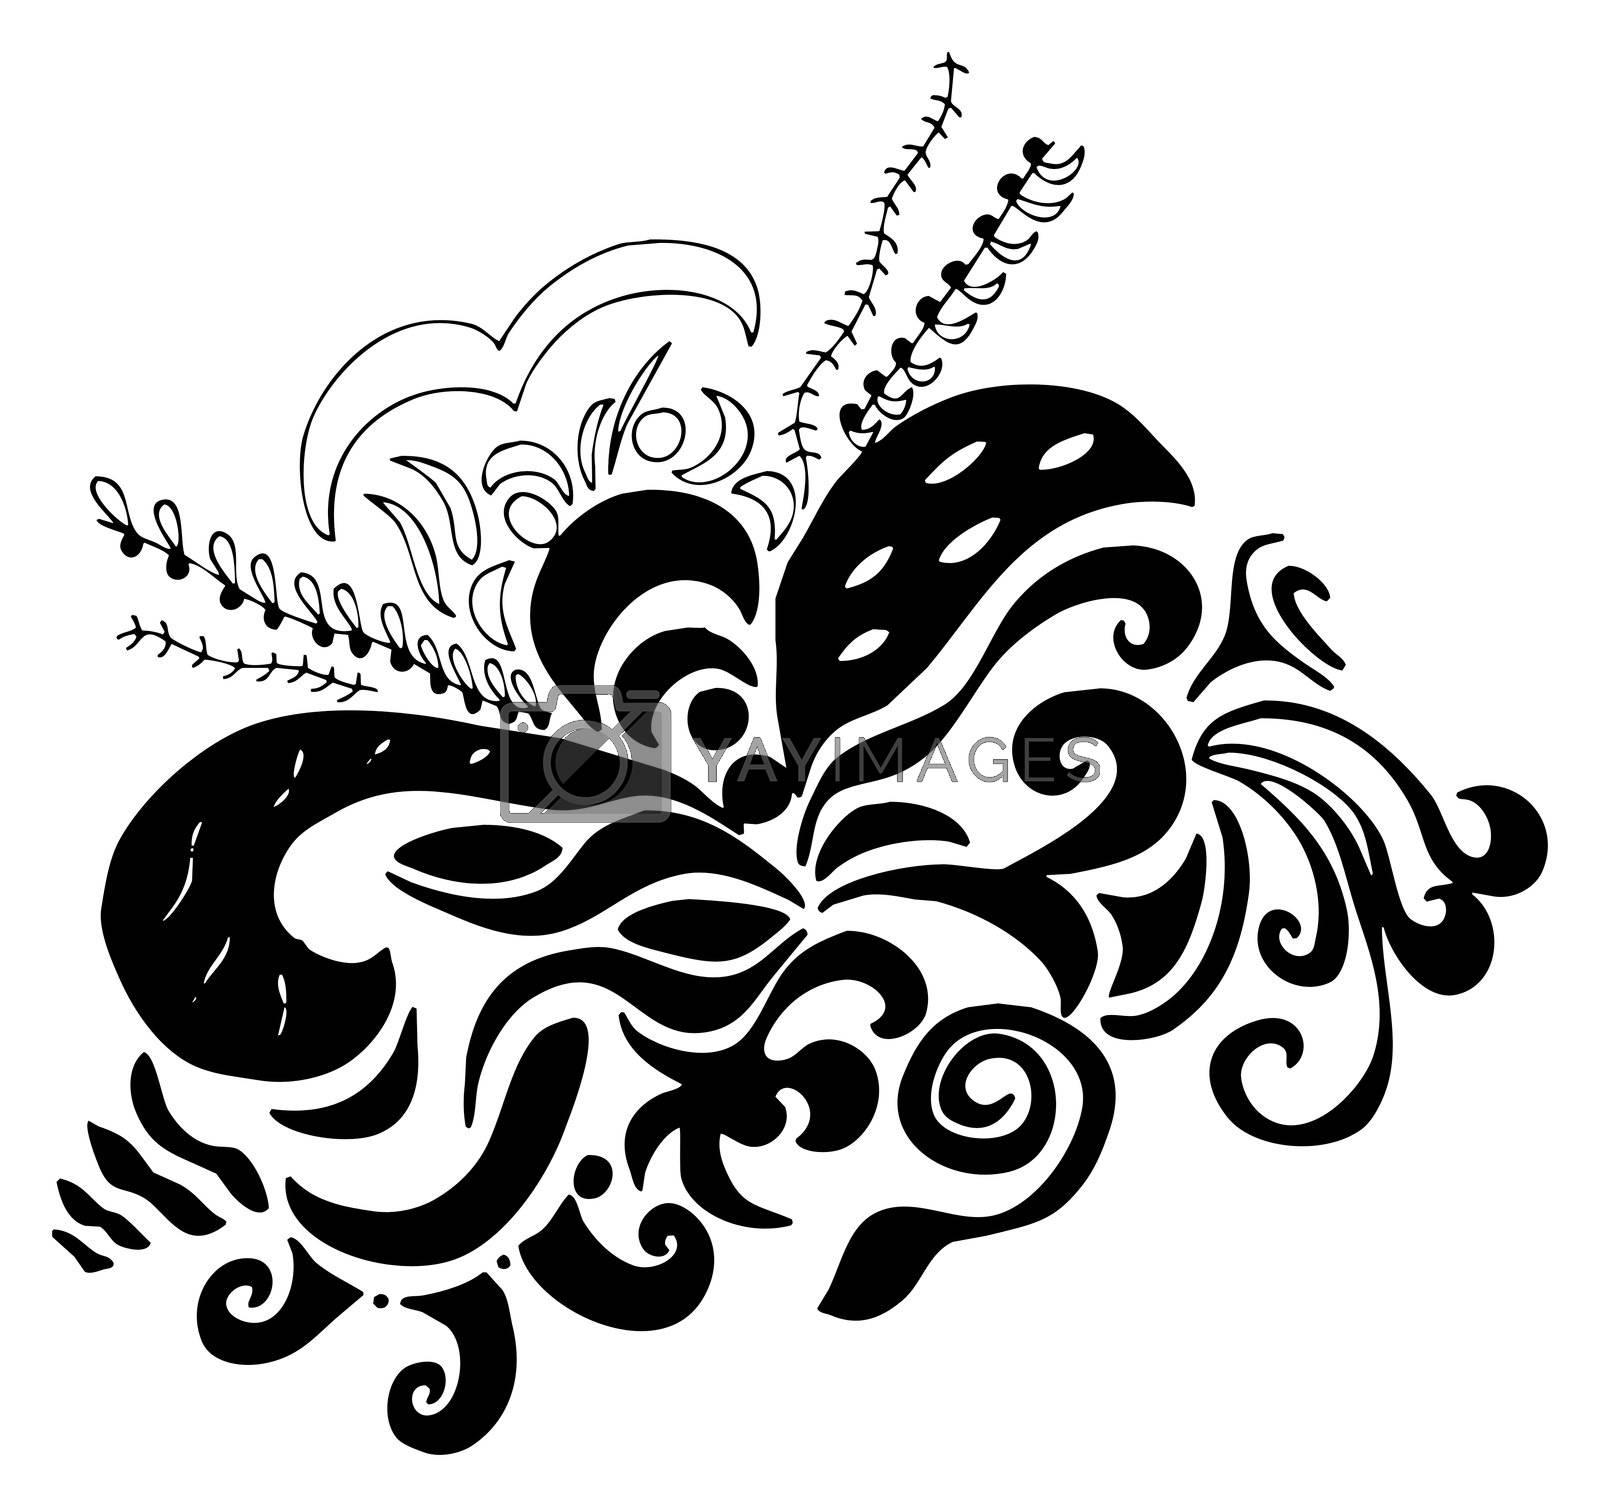 digital illustration of swirls and scrolls � black on white